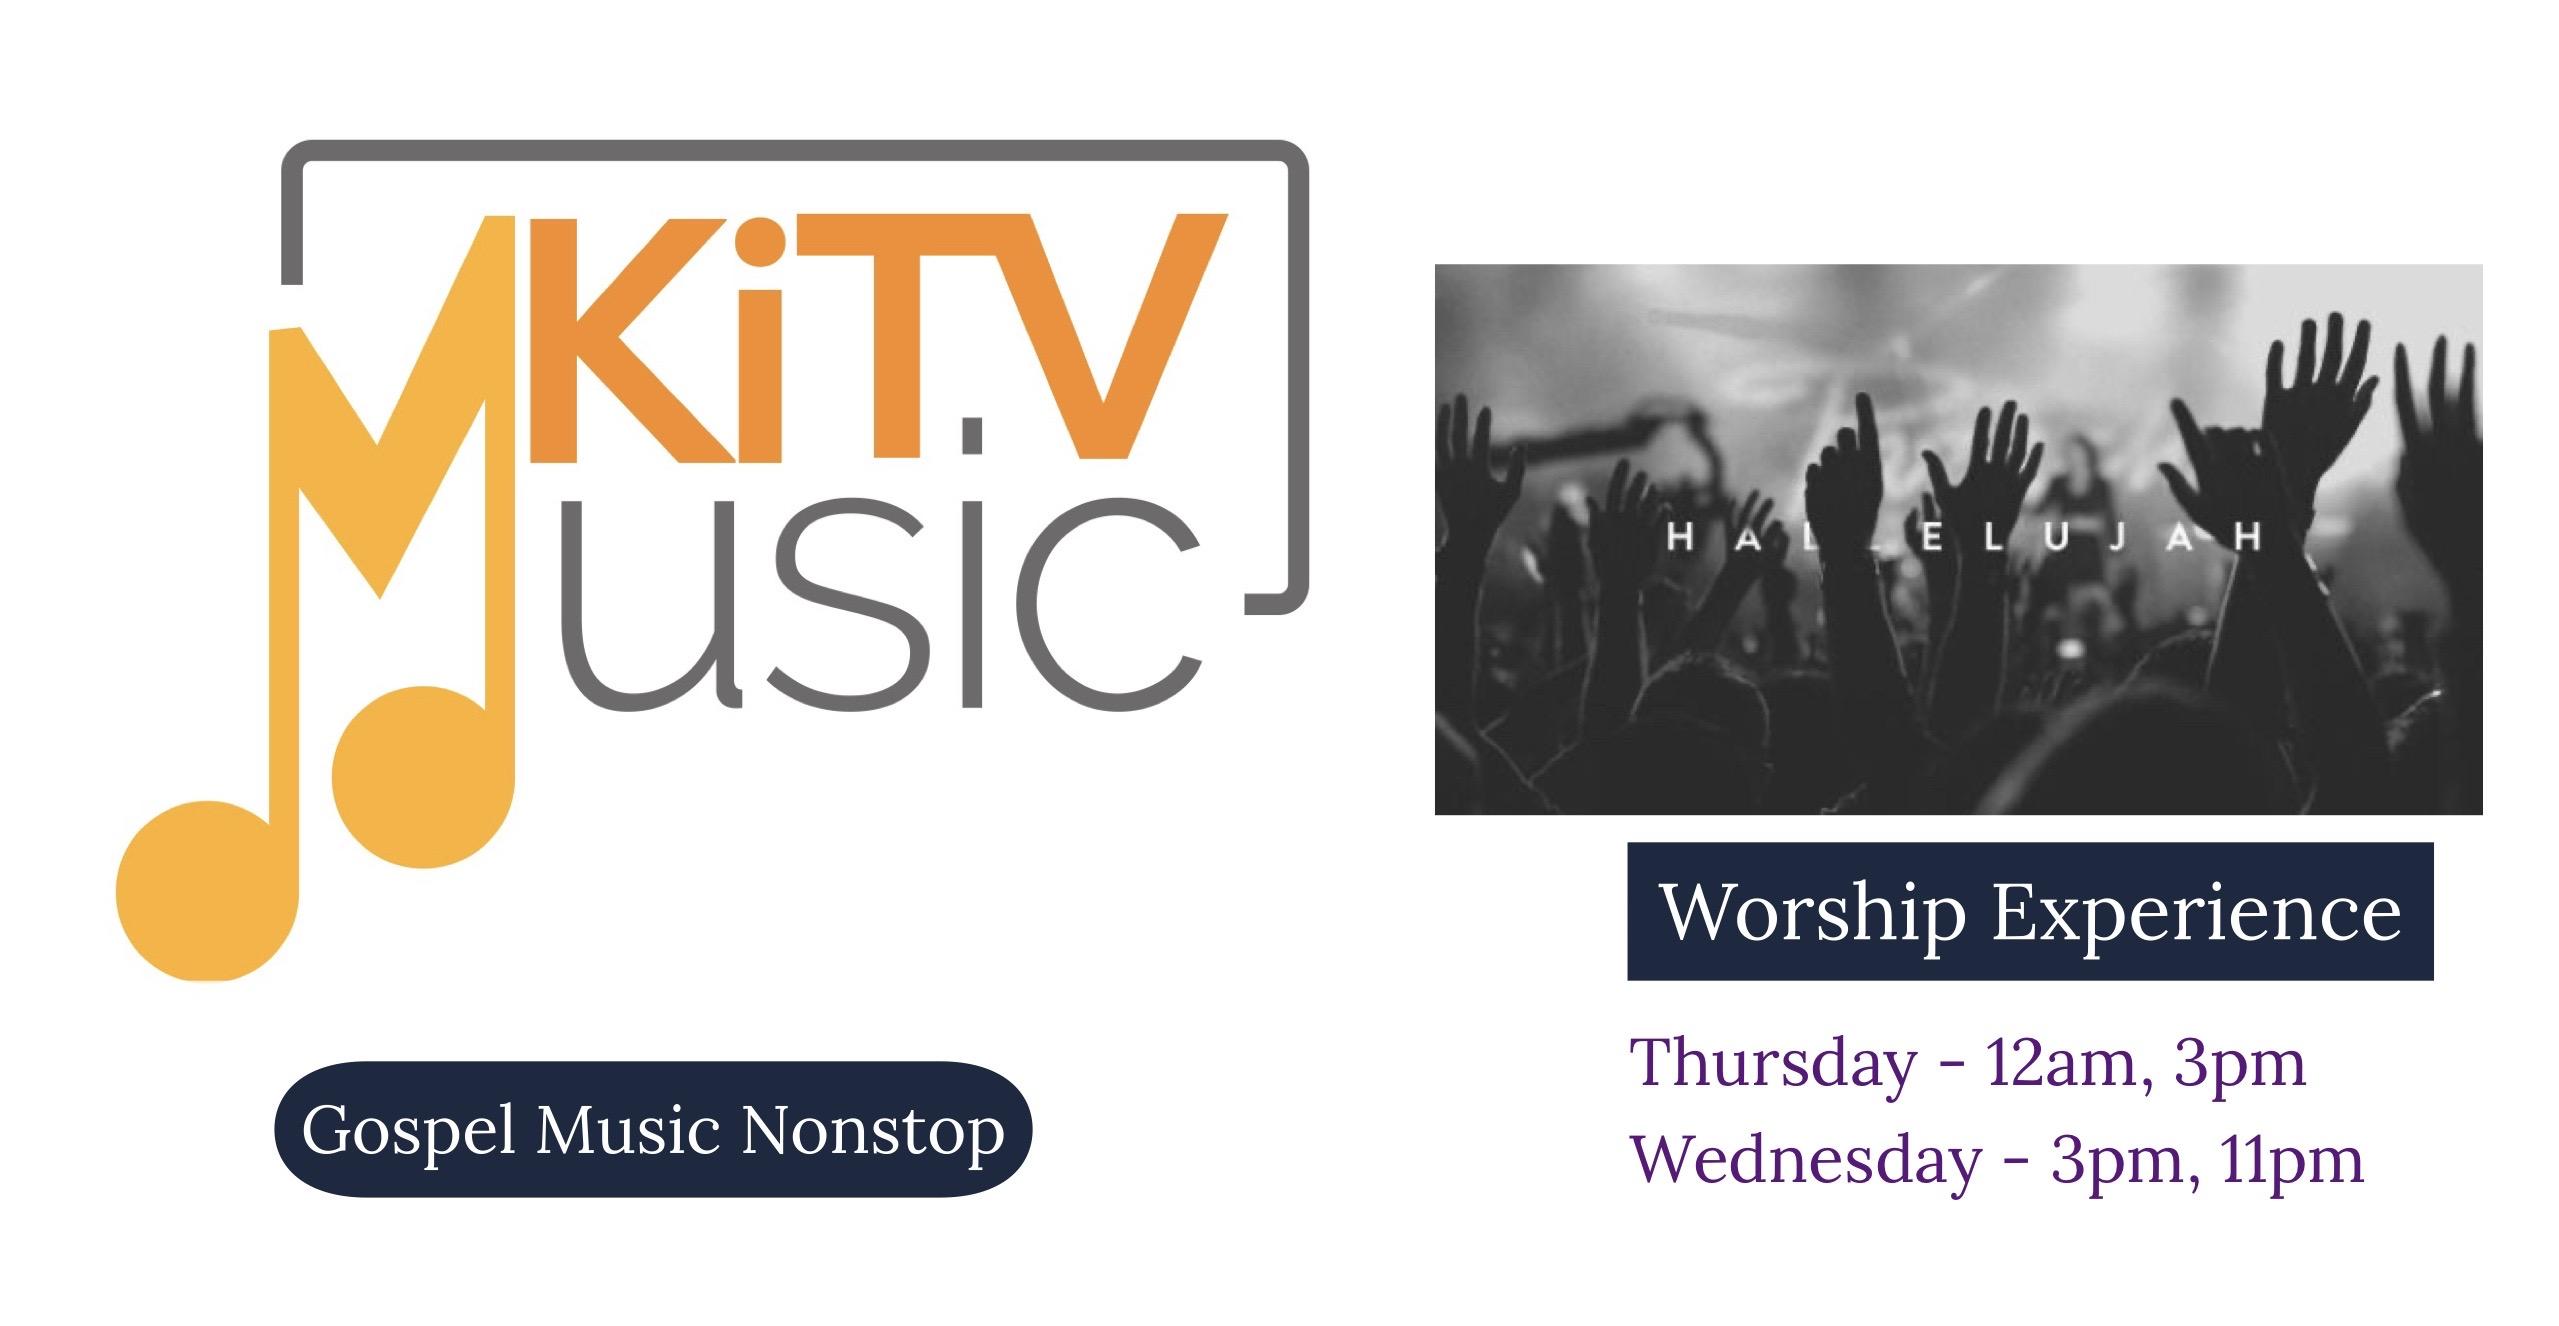 KiTV Music